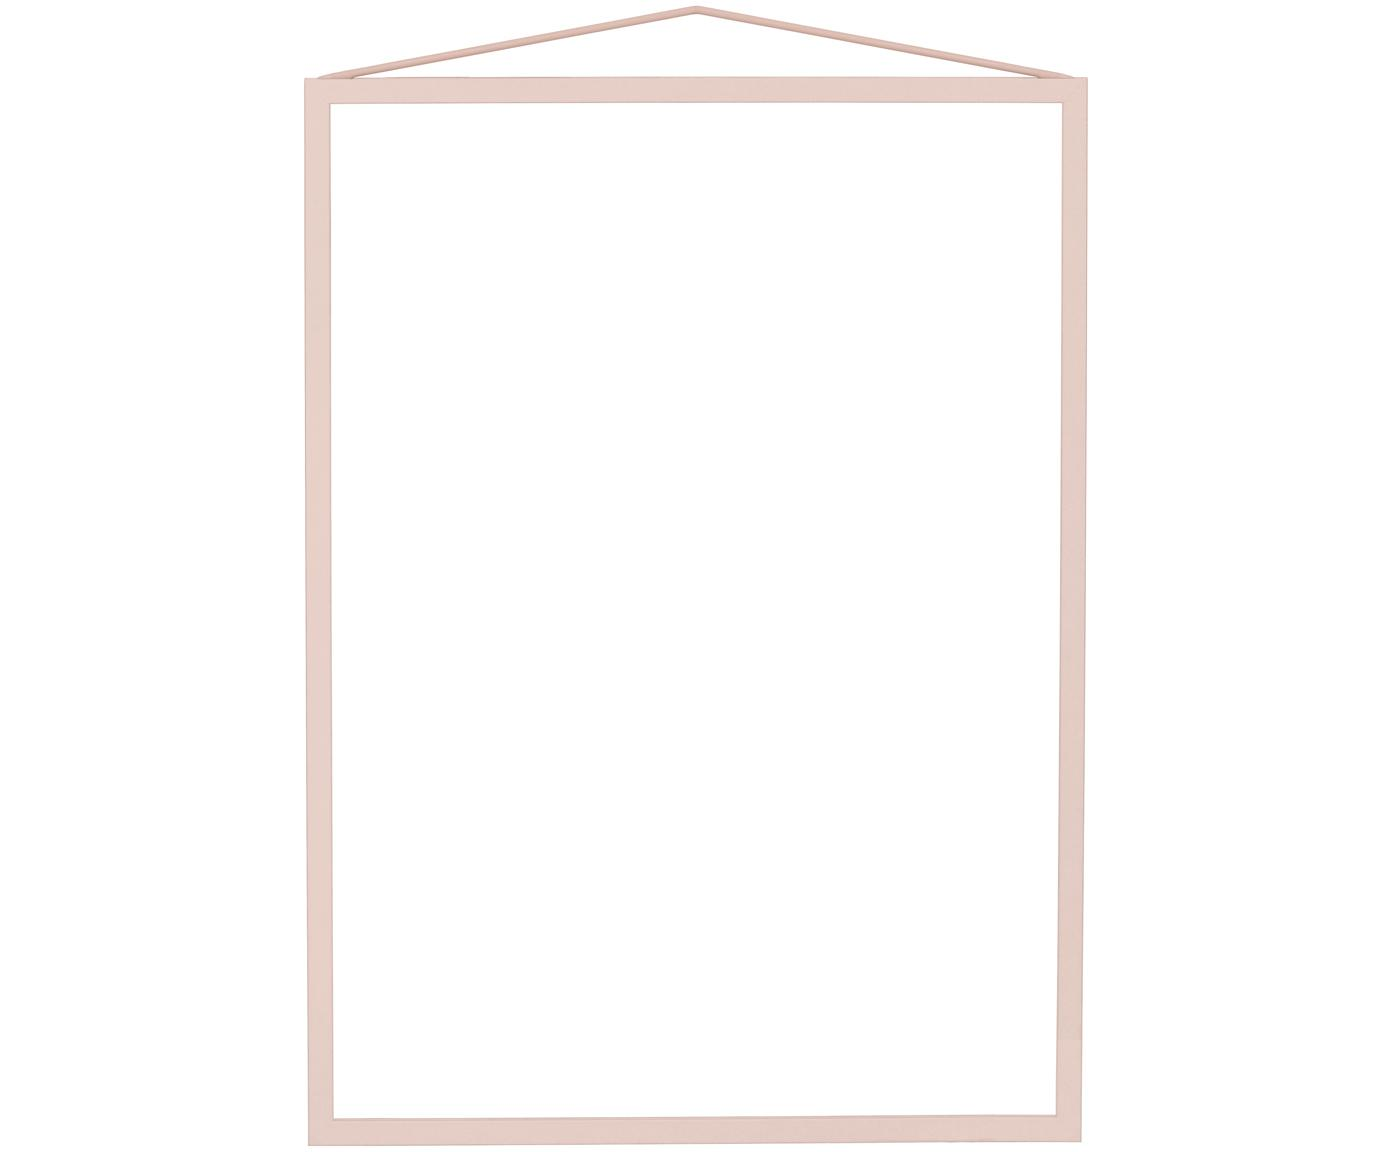 Cornice Colour Frame, Cornice: acciaio, verniciato a pol, Rosa, 30 x 42 cm